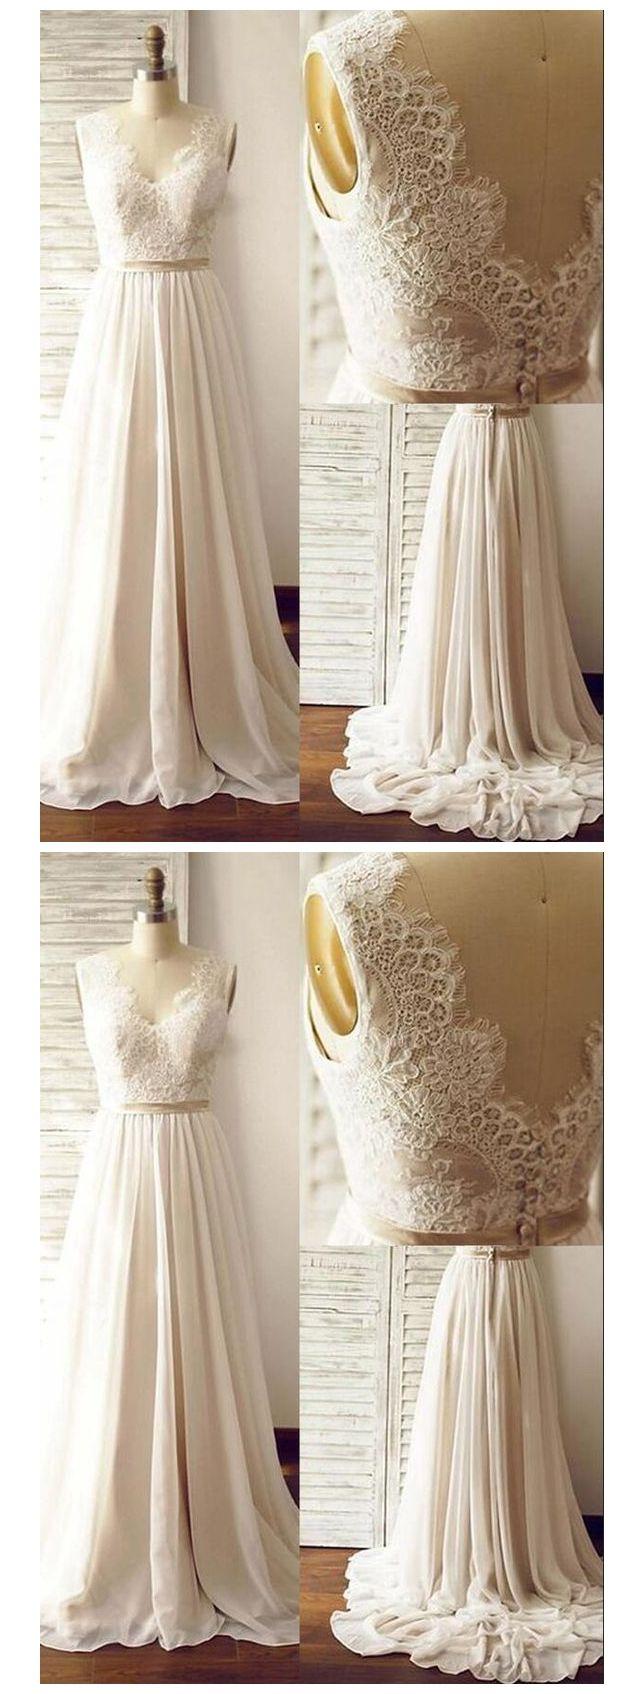 Ivory beach wedding dresses  Aline Vneck Chiffon Skirt Beach Wedding Dresses Lace Bodice Bridal